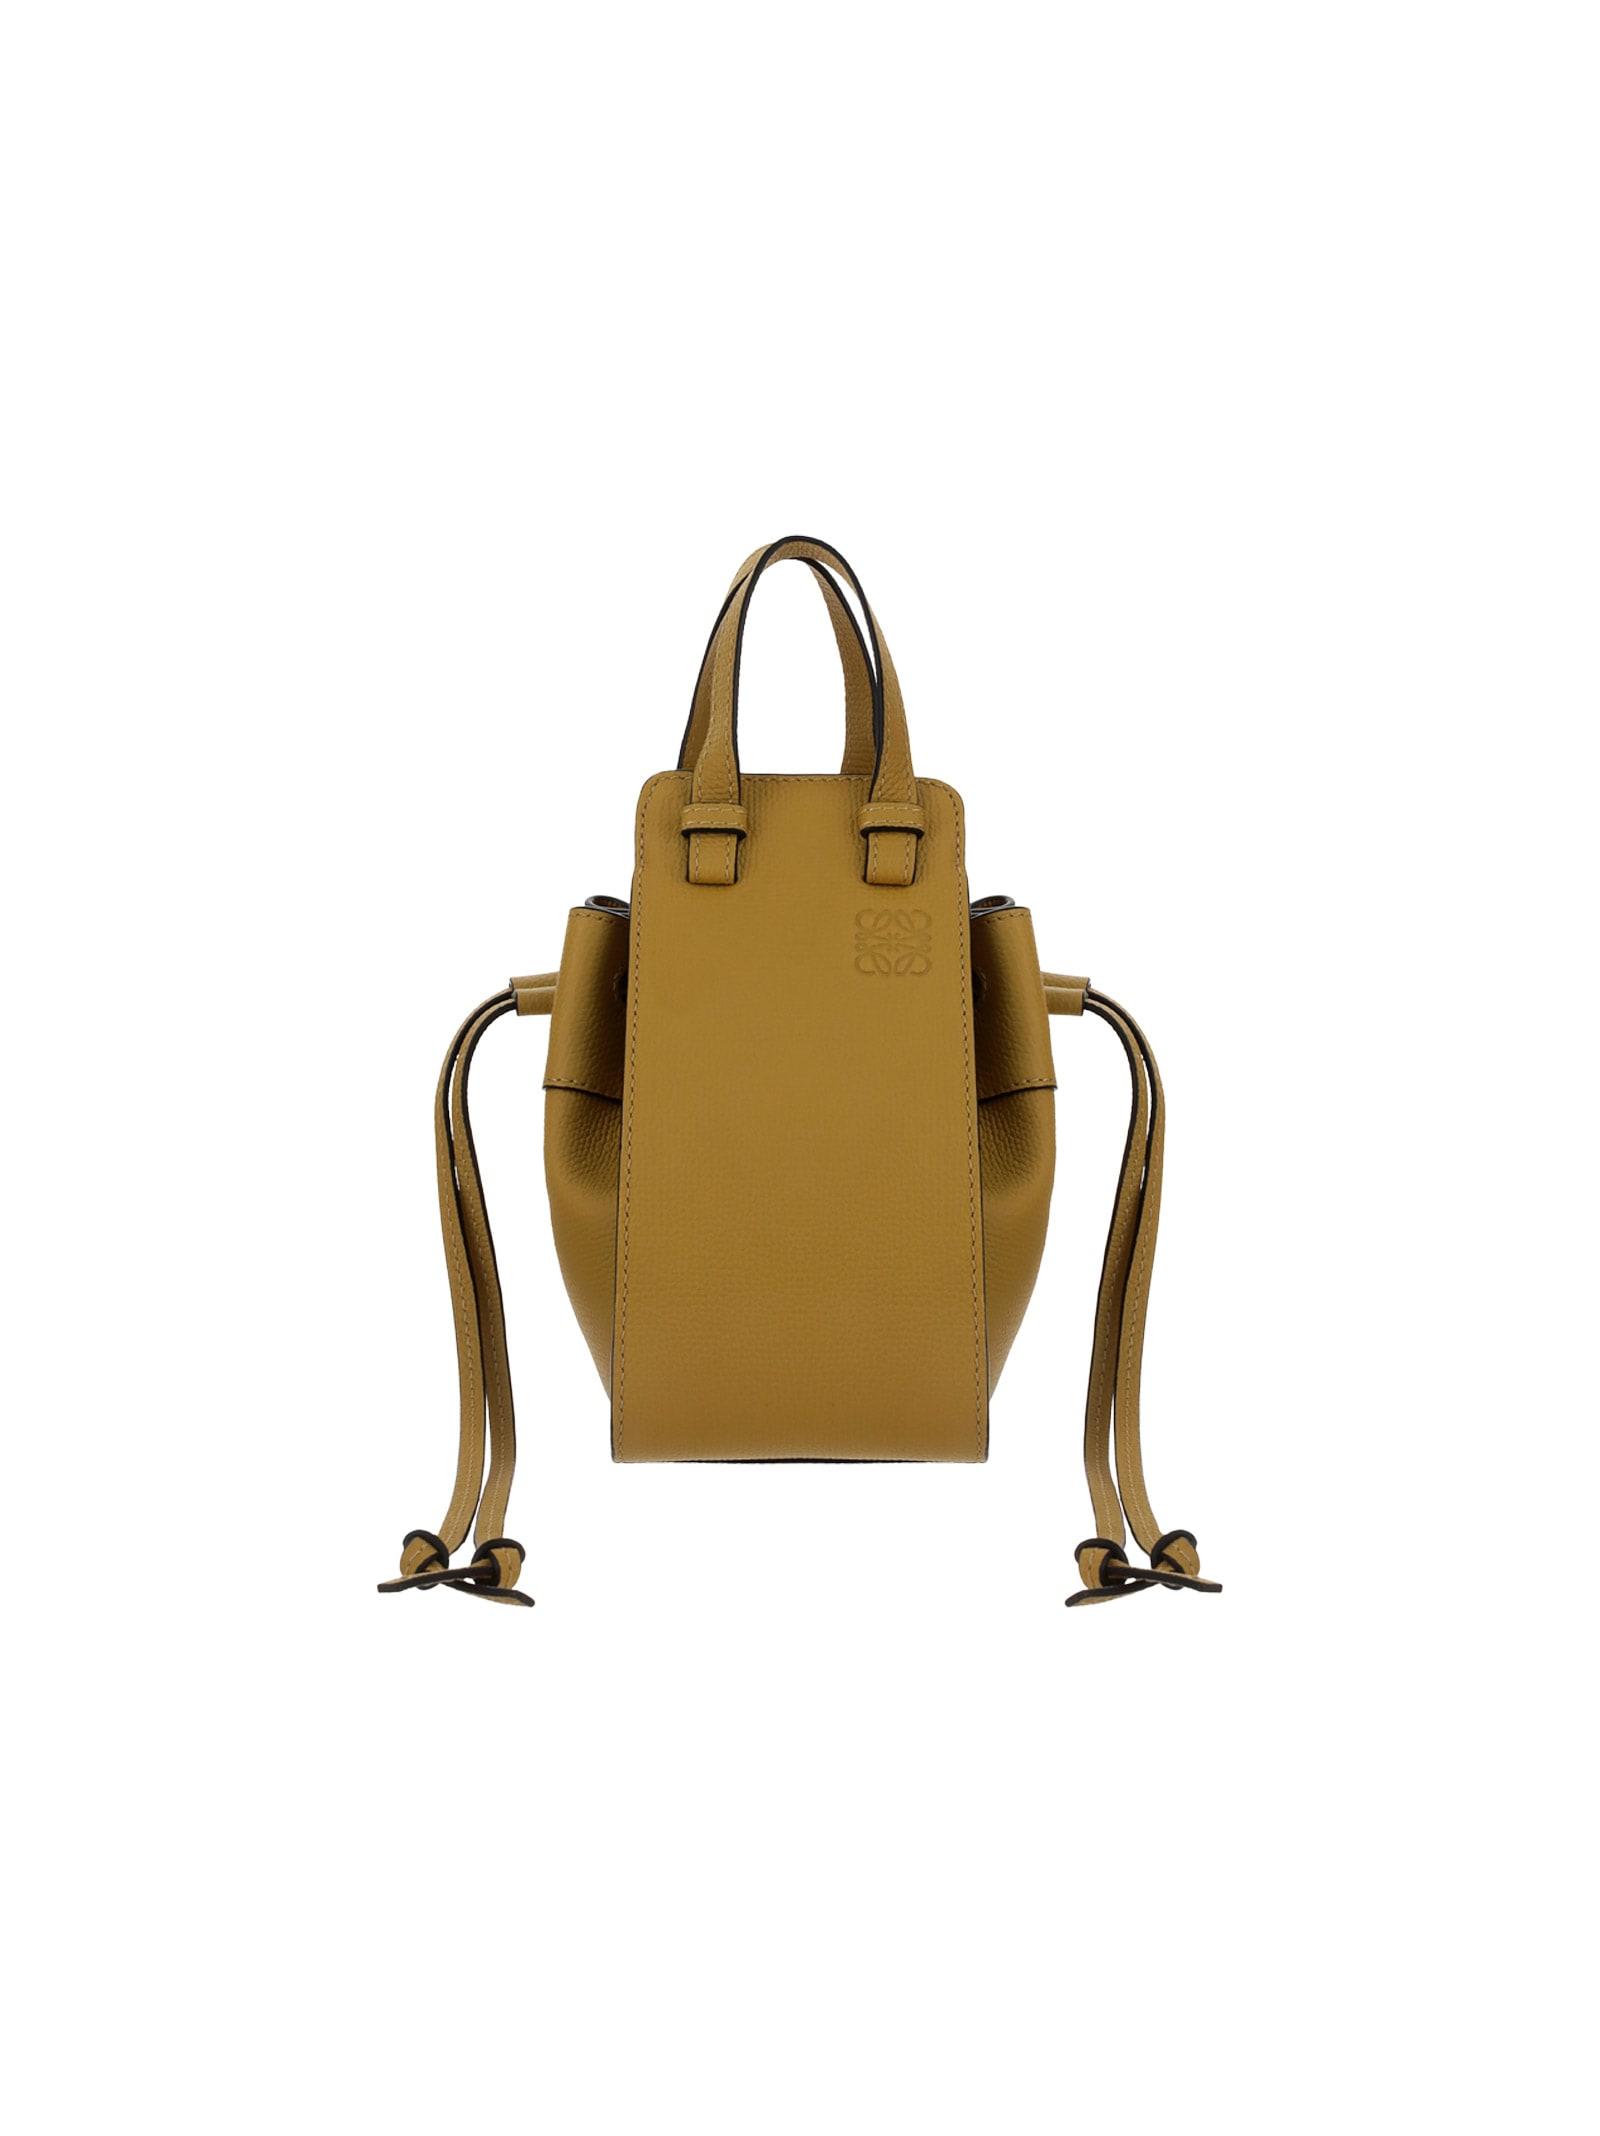 Loewe Mini Dw Hammock Leather Hand Bag